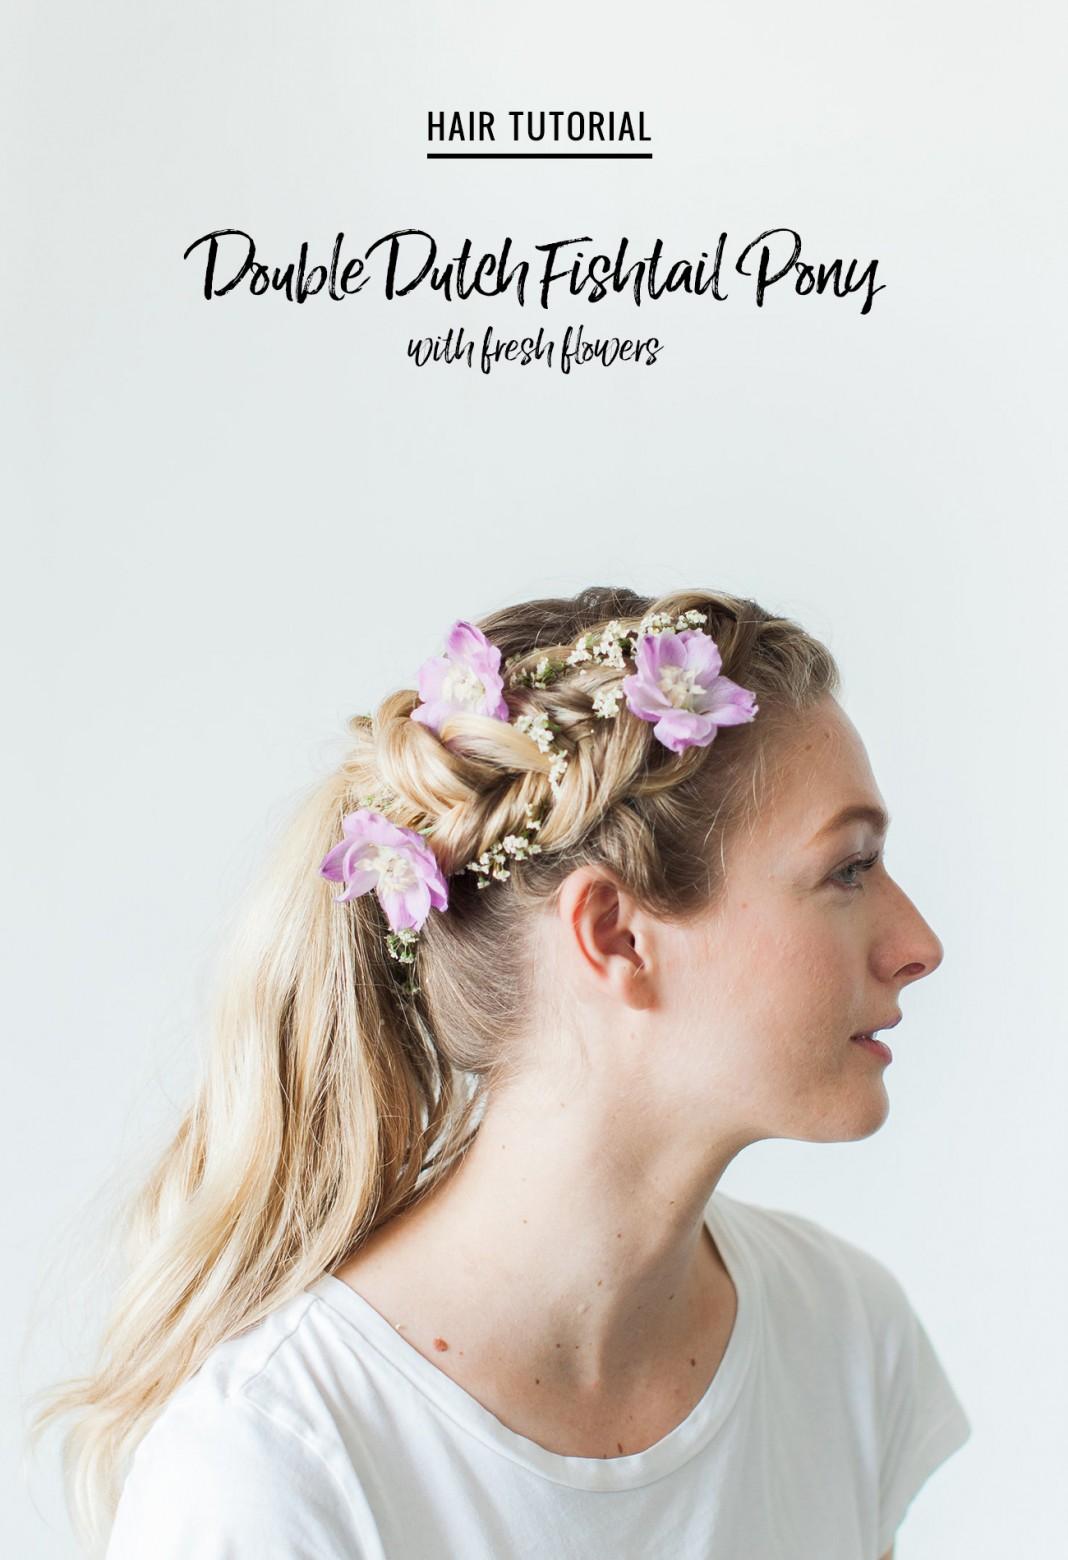 Hair Tutorial: Double Dutch Fishtail Pony with Fresh Flowers